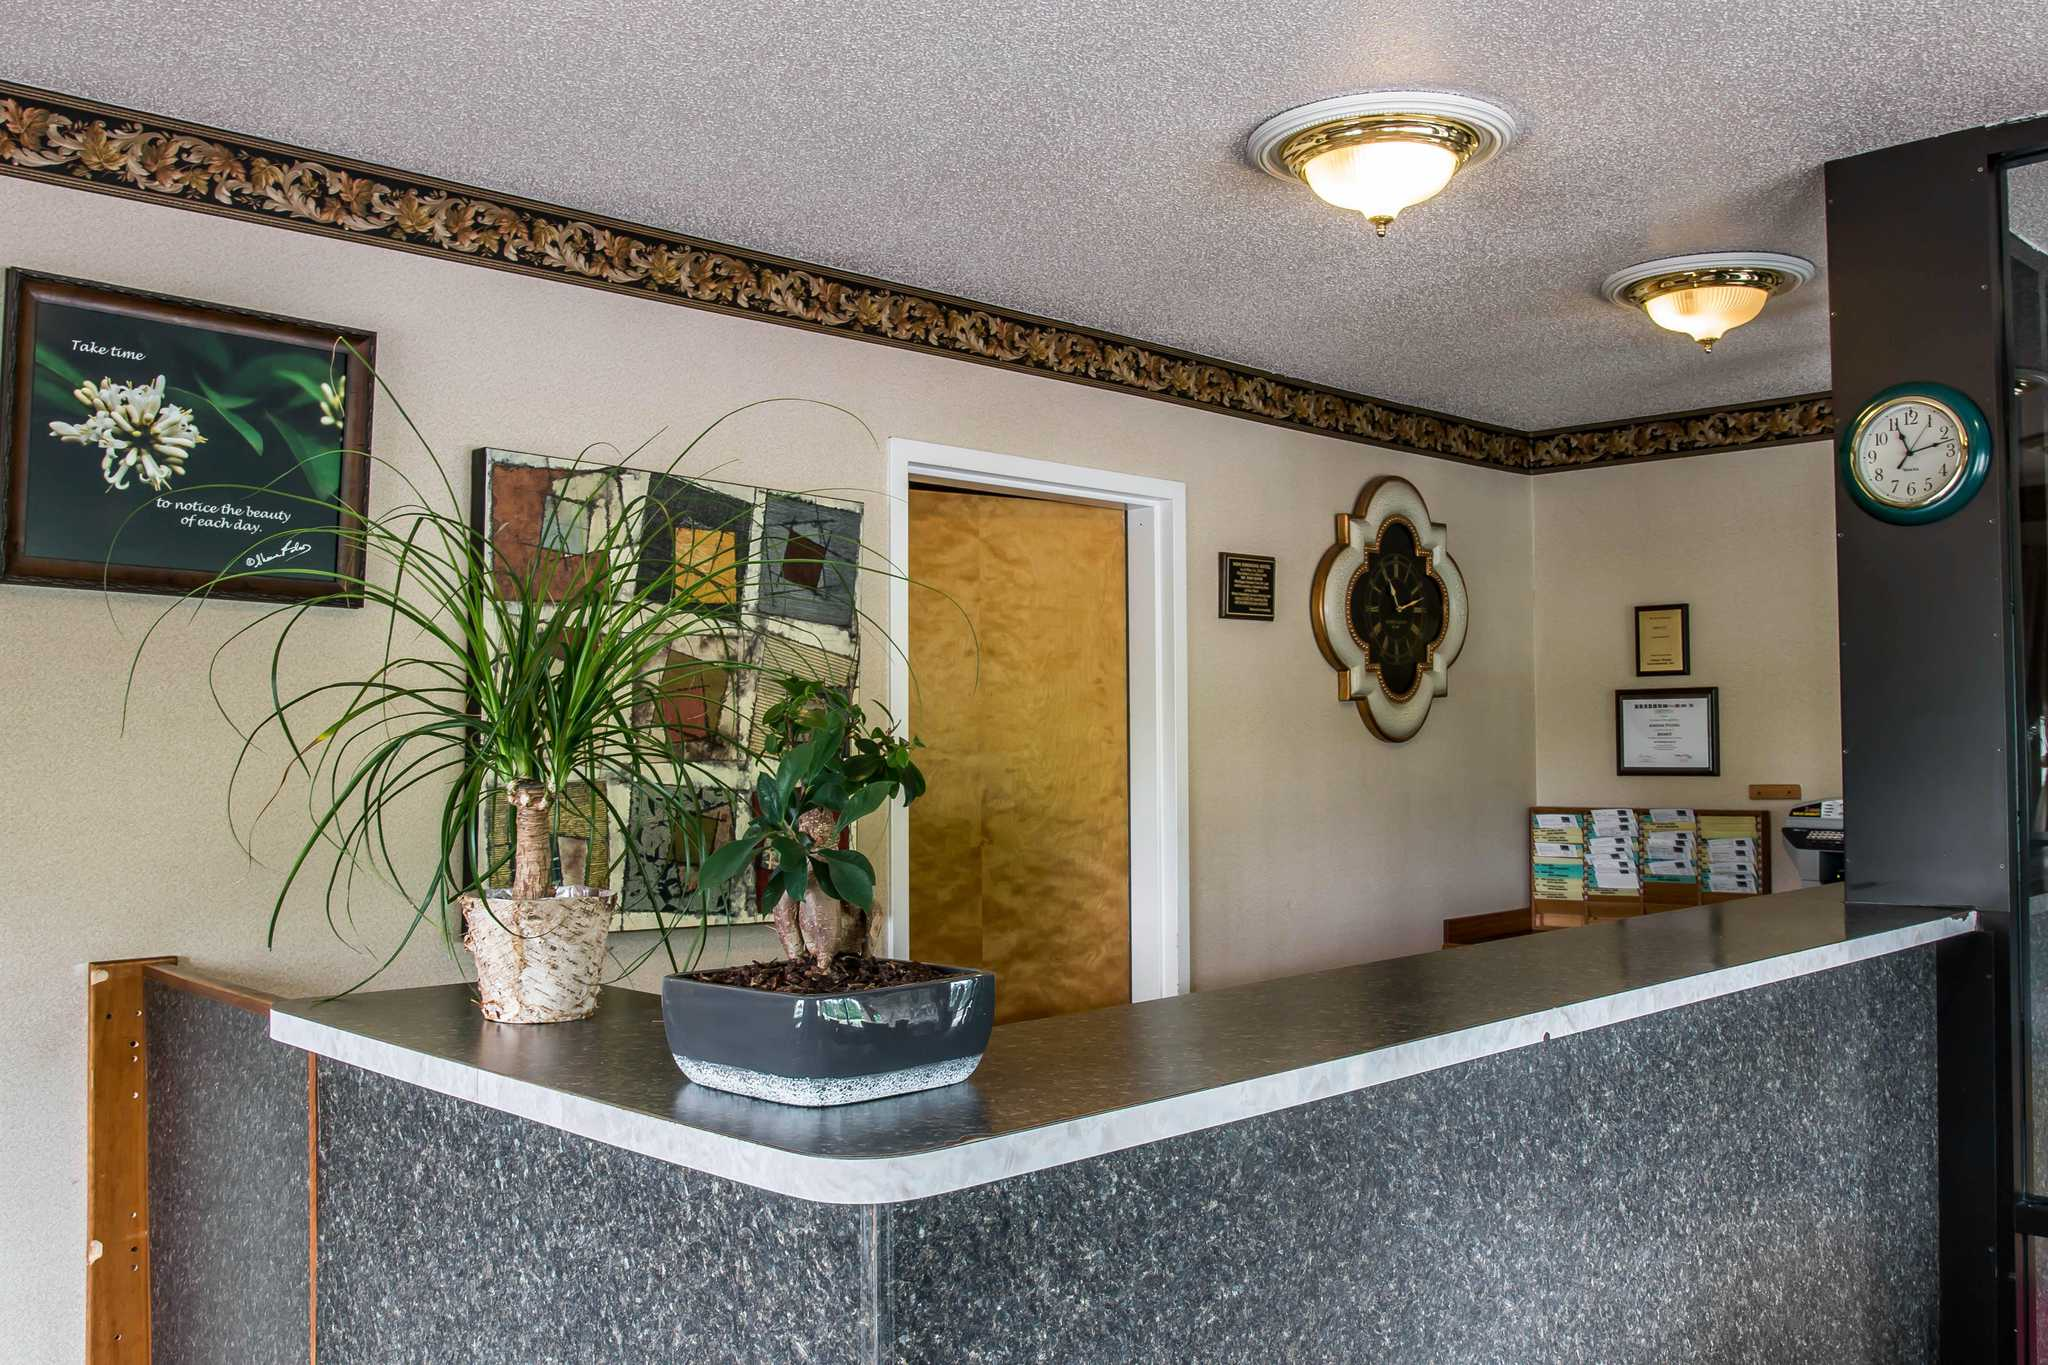 Econo Lodge image 21